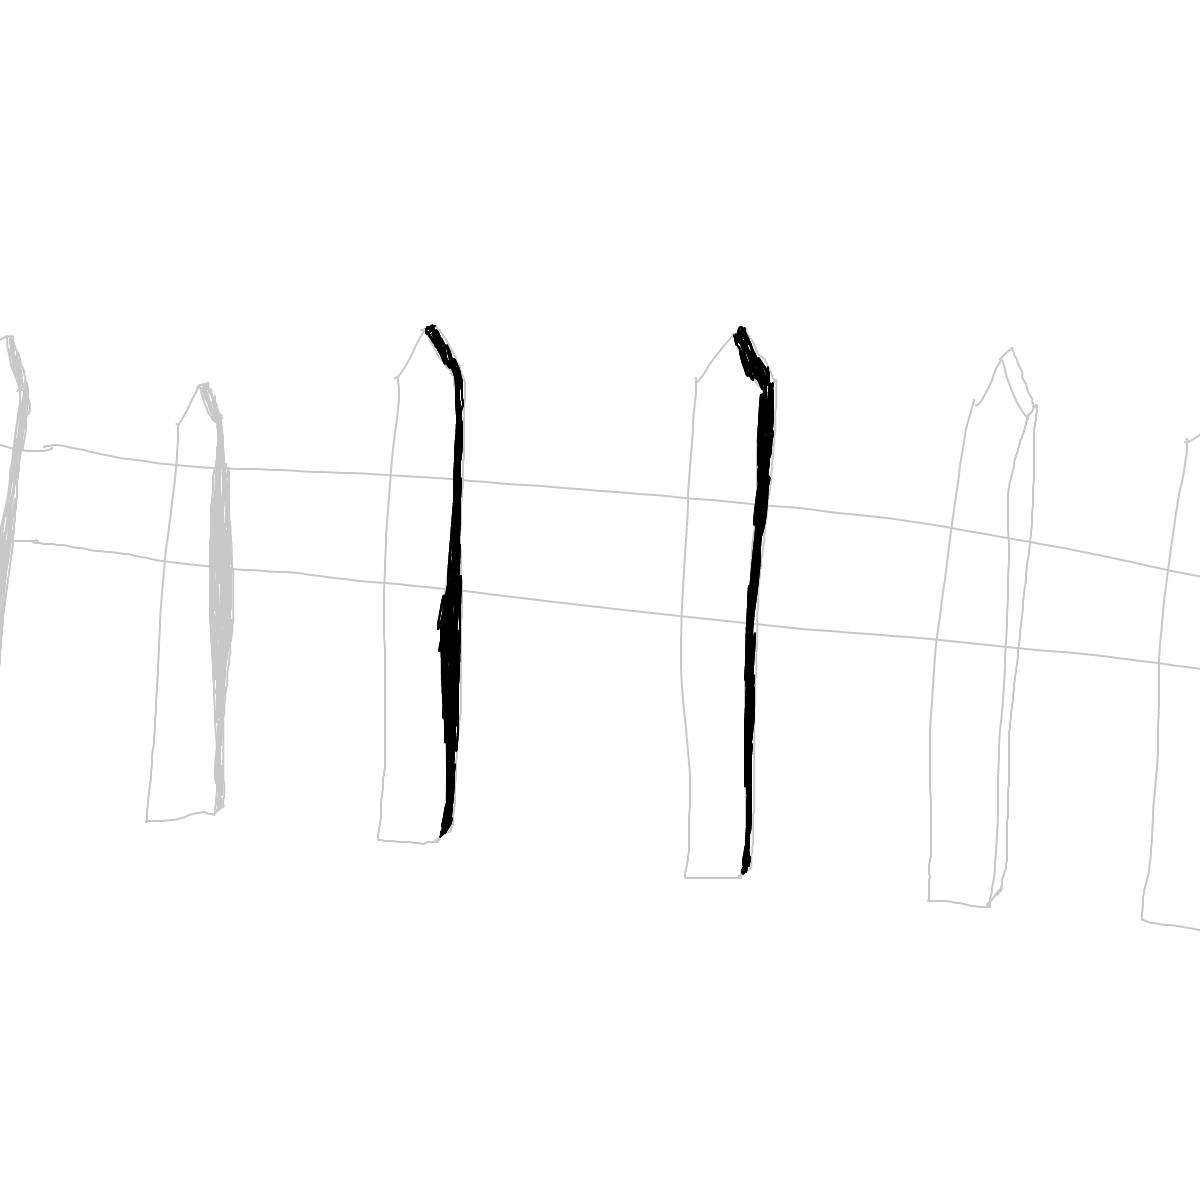 BAAAM drawing#9376 lat:52.4750518798828100lng: 13.4071702957153320